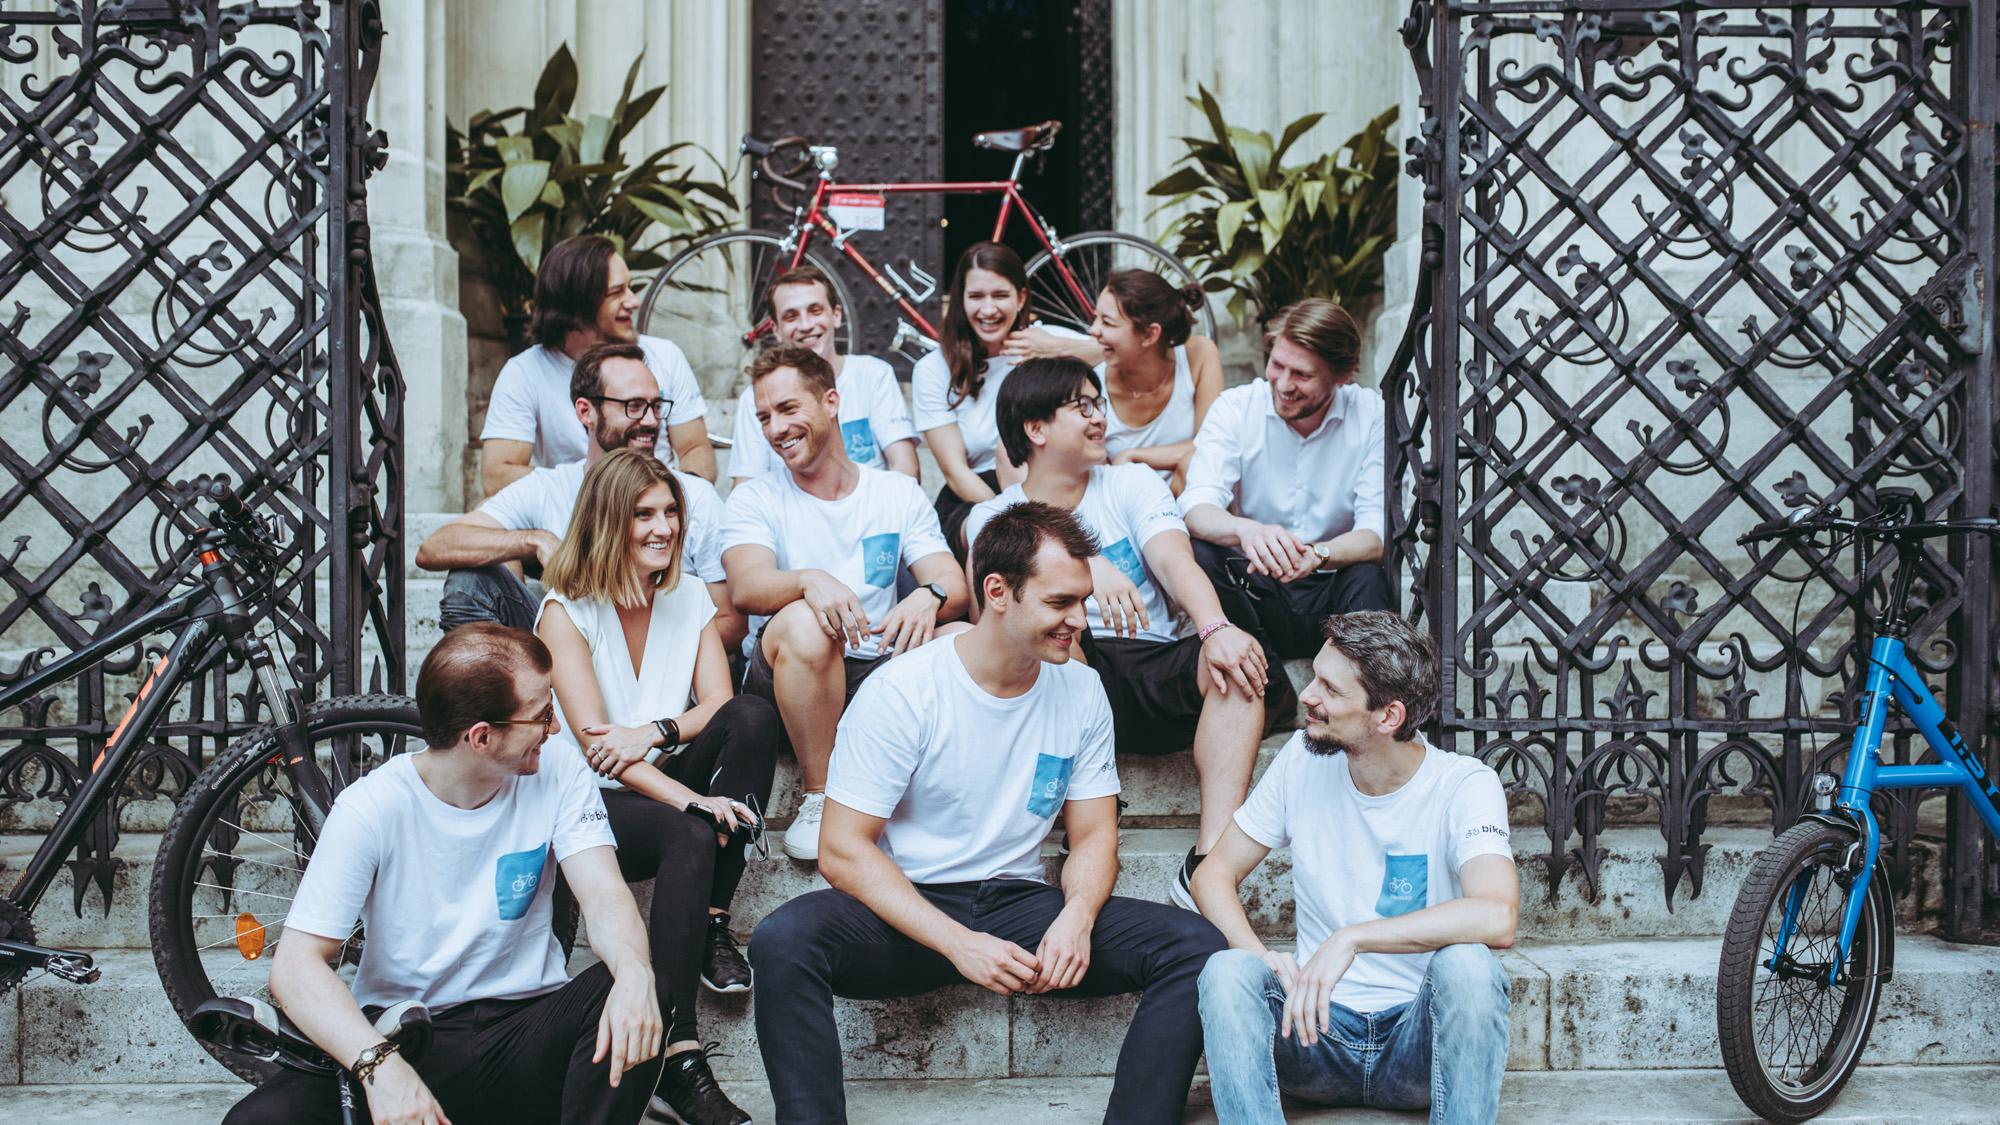 Das Bikemap-Team © Bikemap/Niklas Stadler